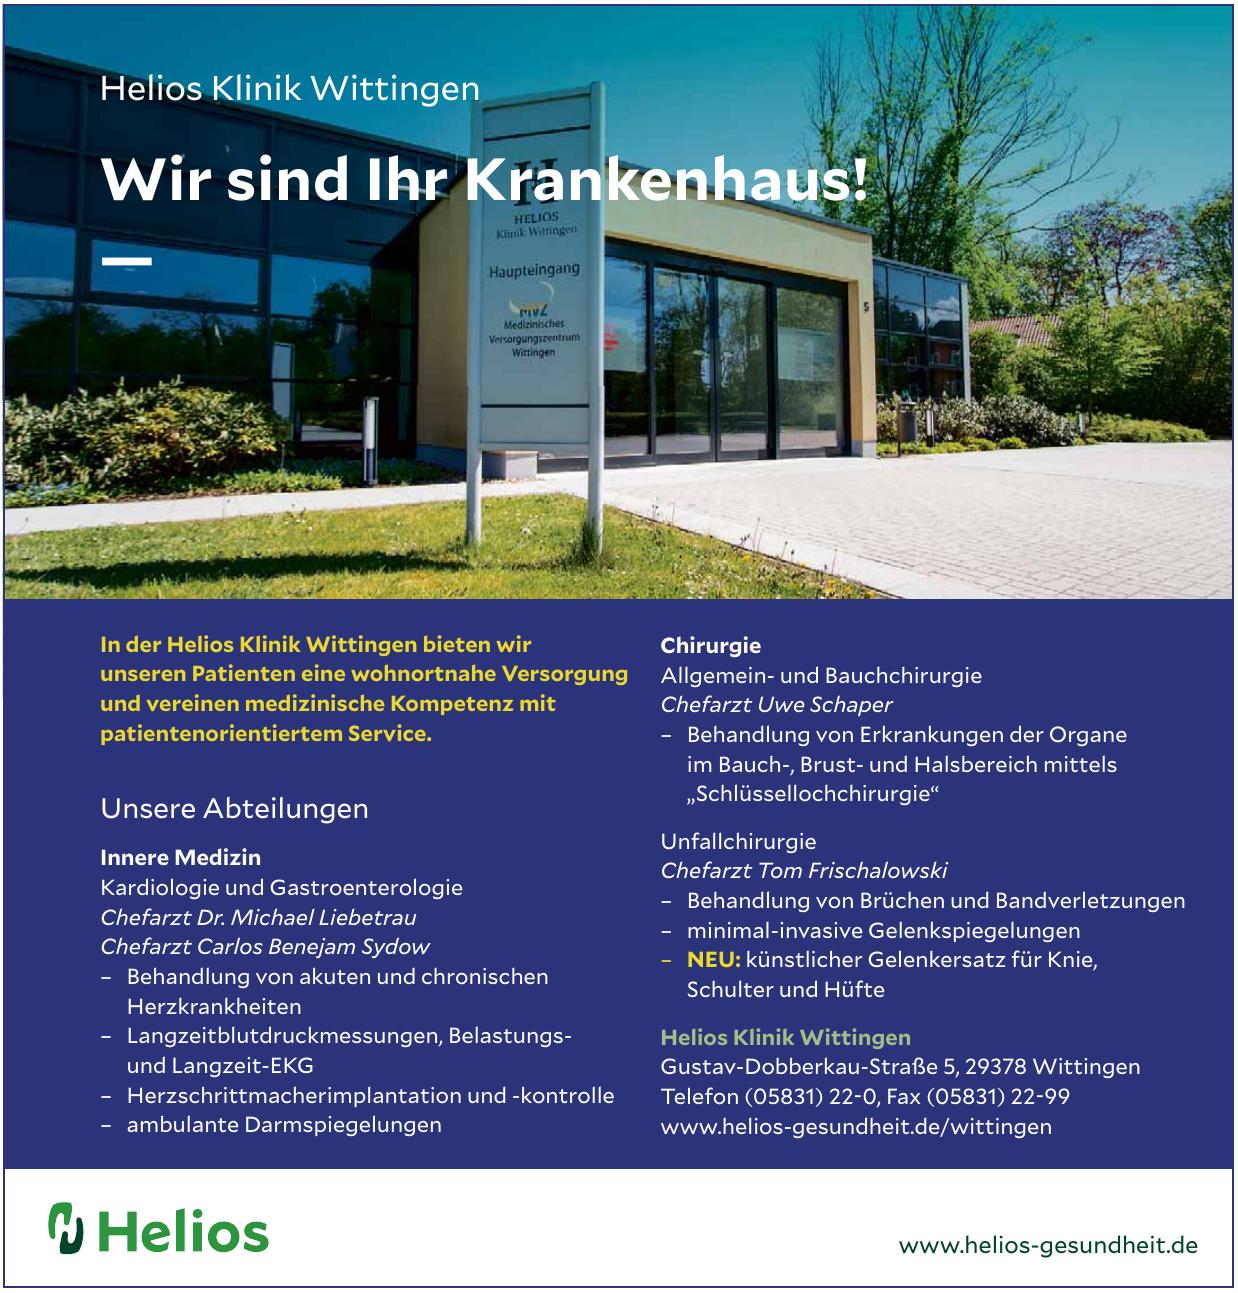 Helios Klinik Wittingen